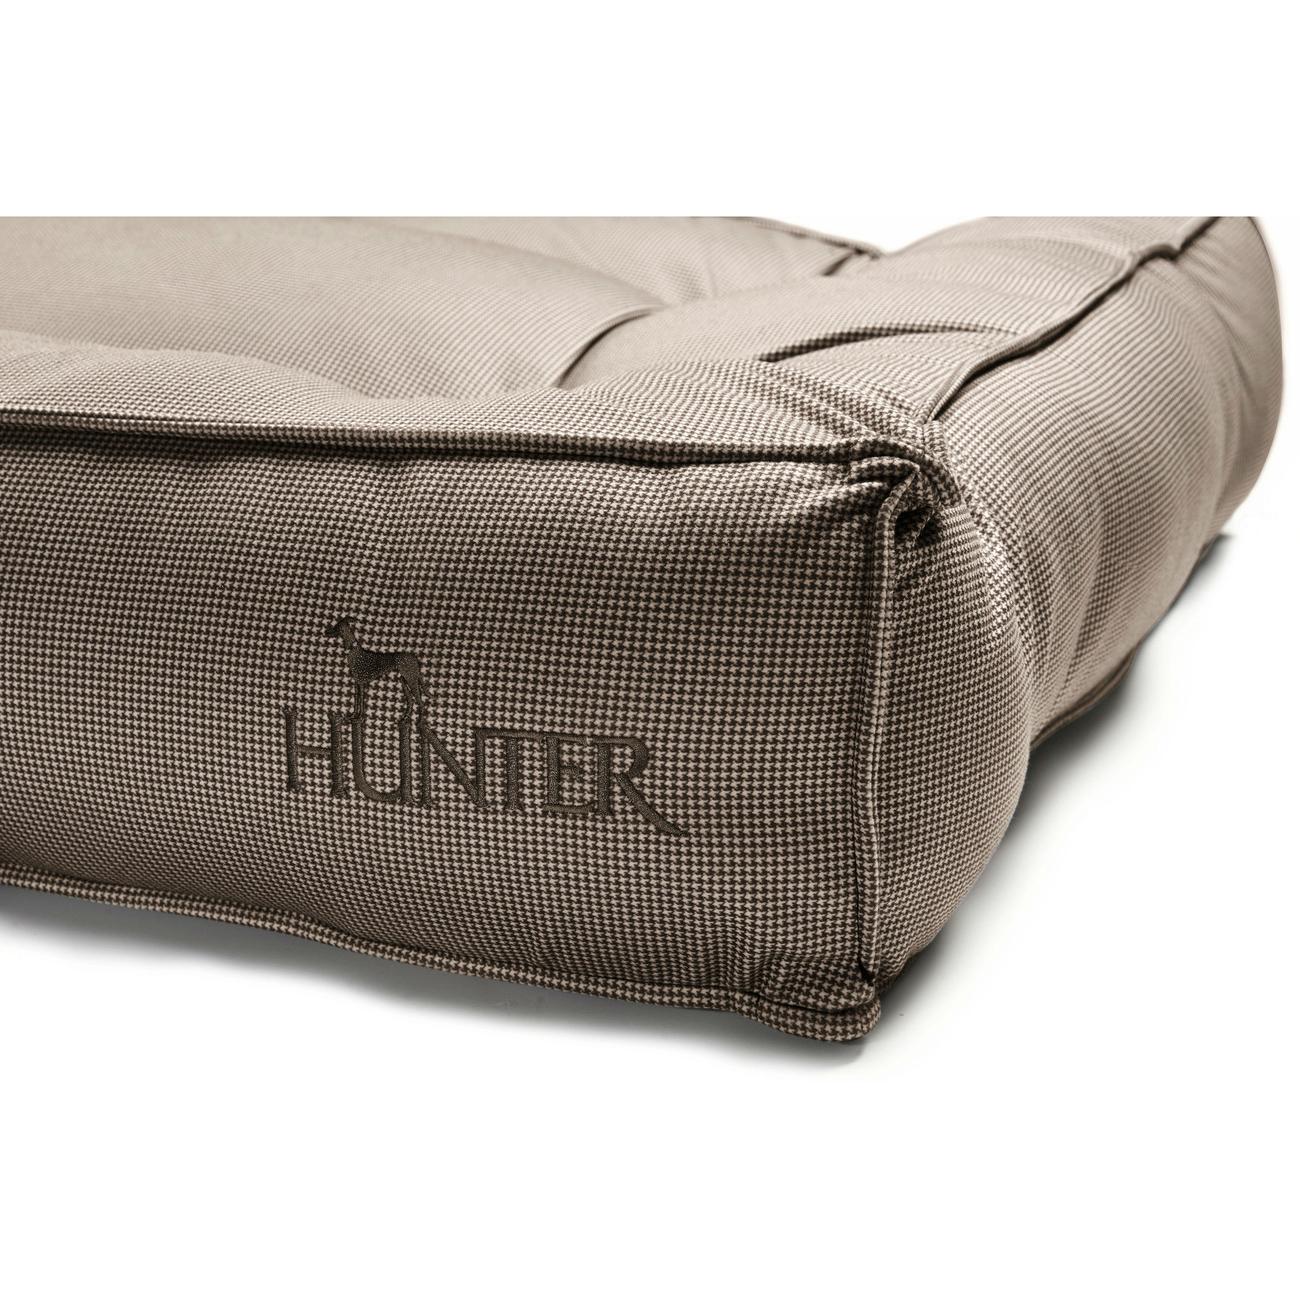 Hunter Hundebett Lancaster 65057, Bild 7